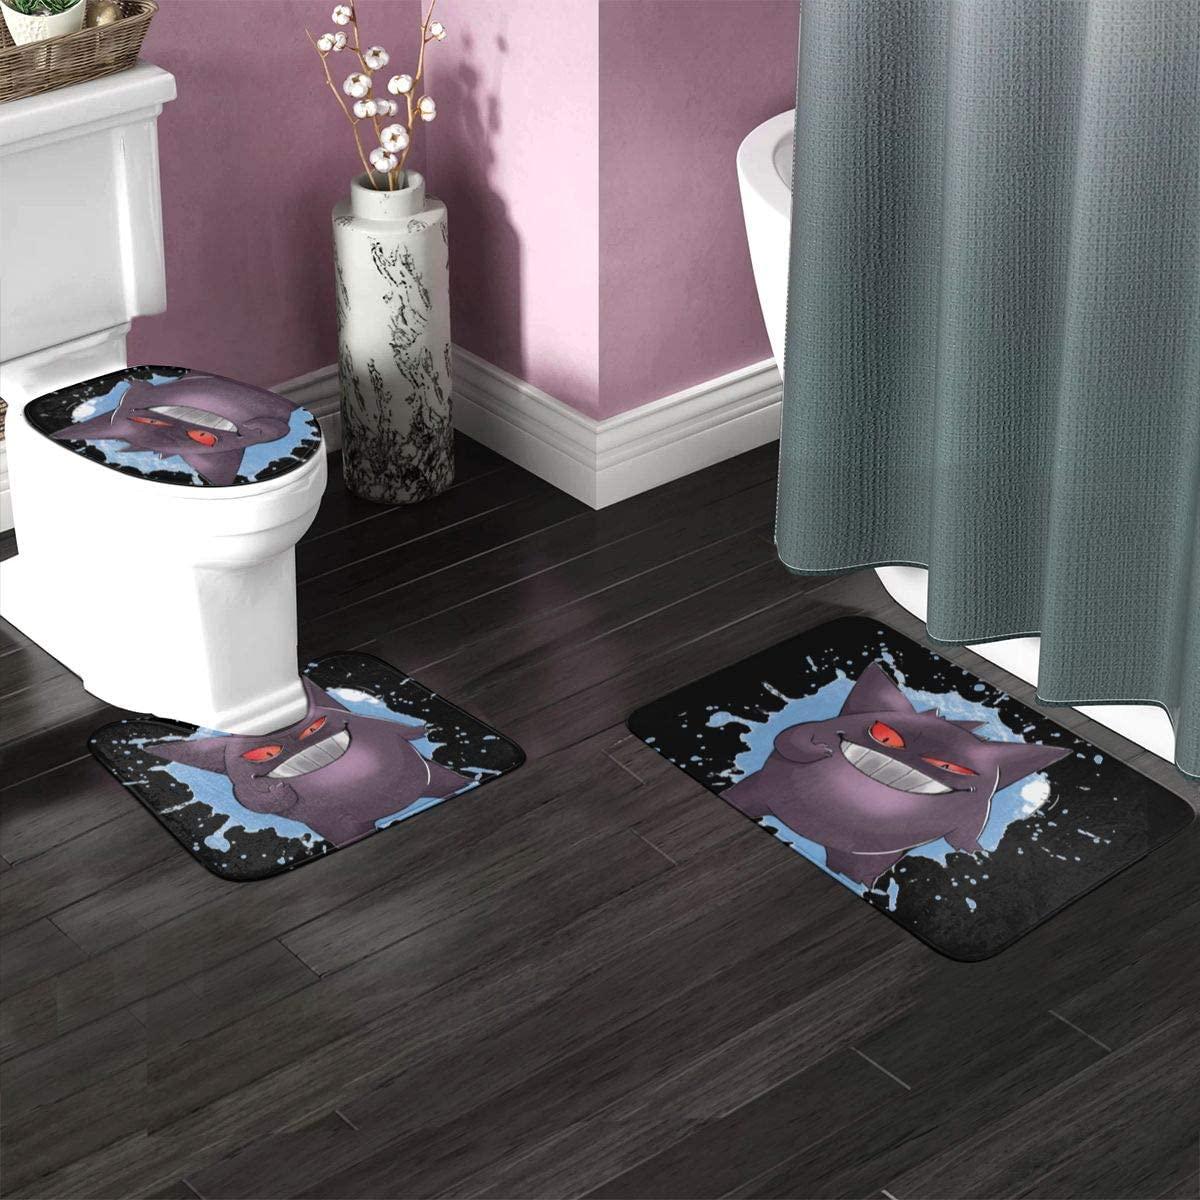 3 Pieces Bathroom Rugs Set 23.6x15.7 Gengar Poke-mon Non Slip Soft Absorbent Memory Foam Bath Rug Set with U Shape Contour Mat Toilet Lid Cover for Tub Shower Bathroom